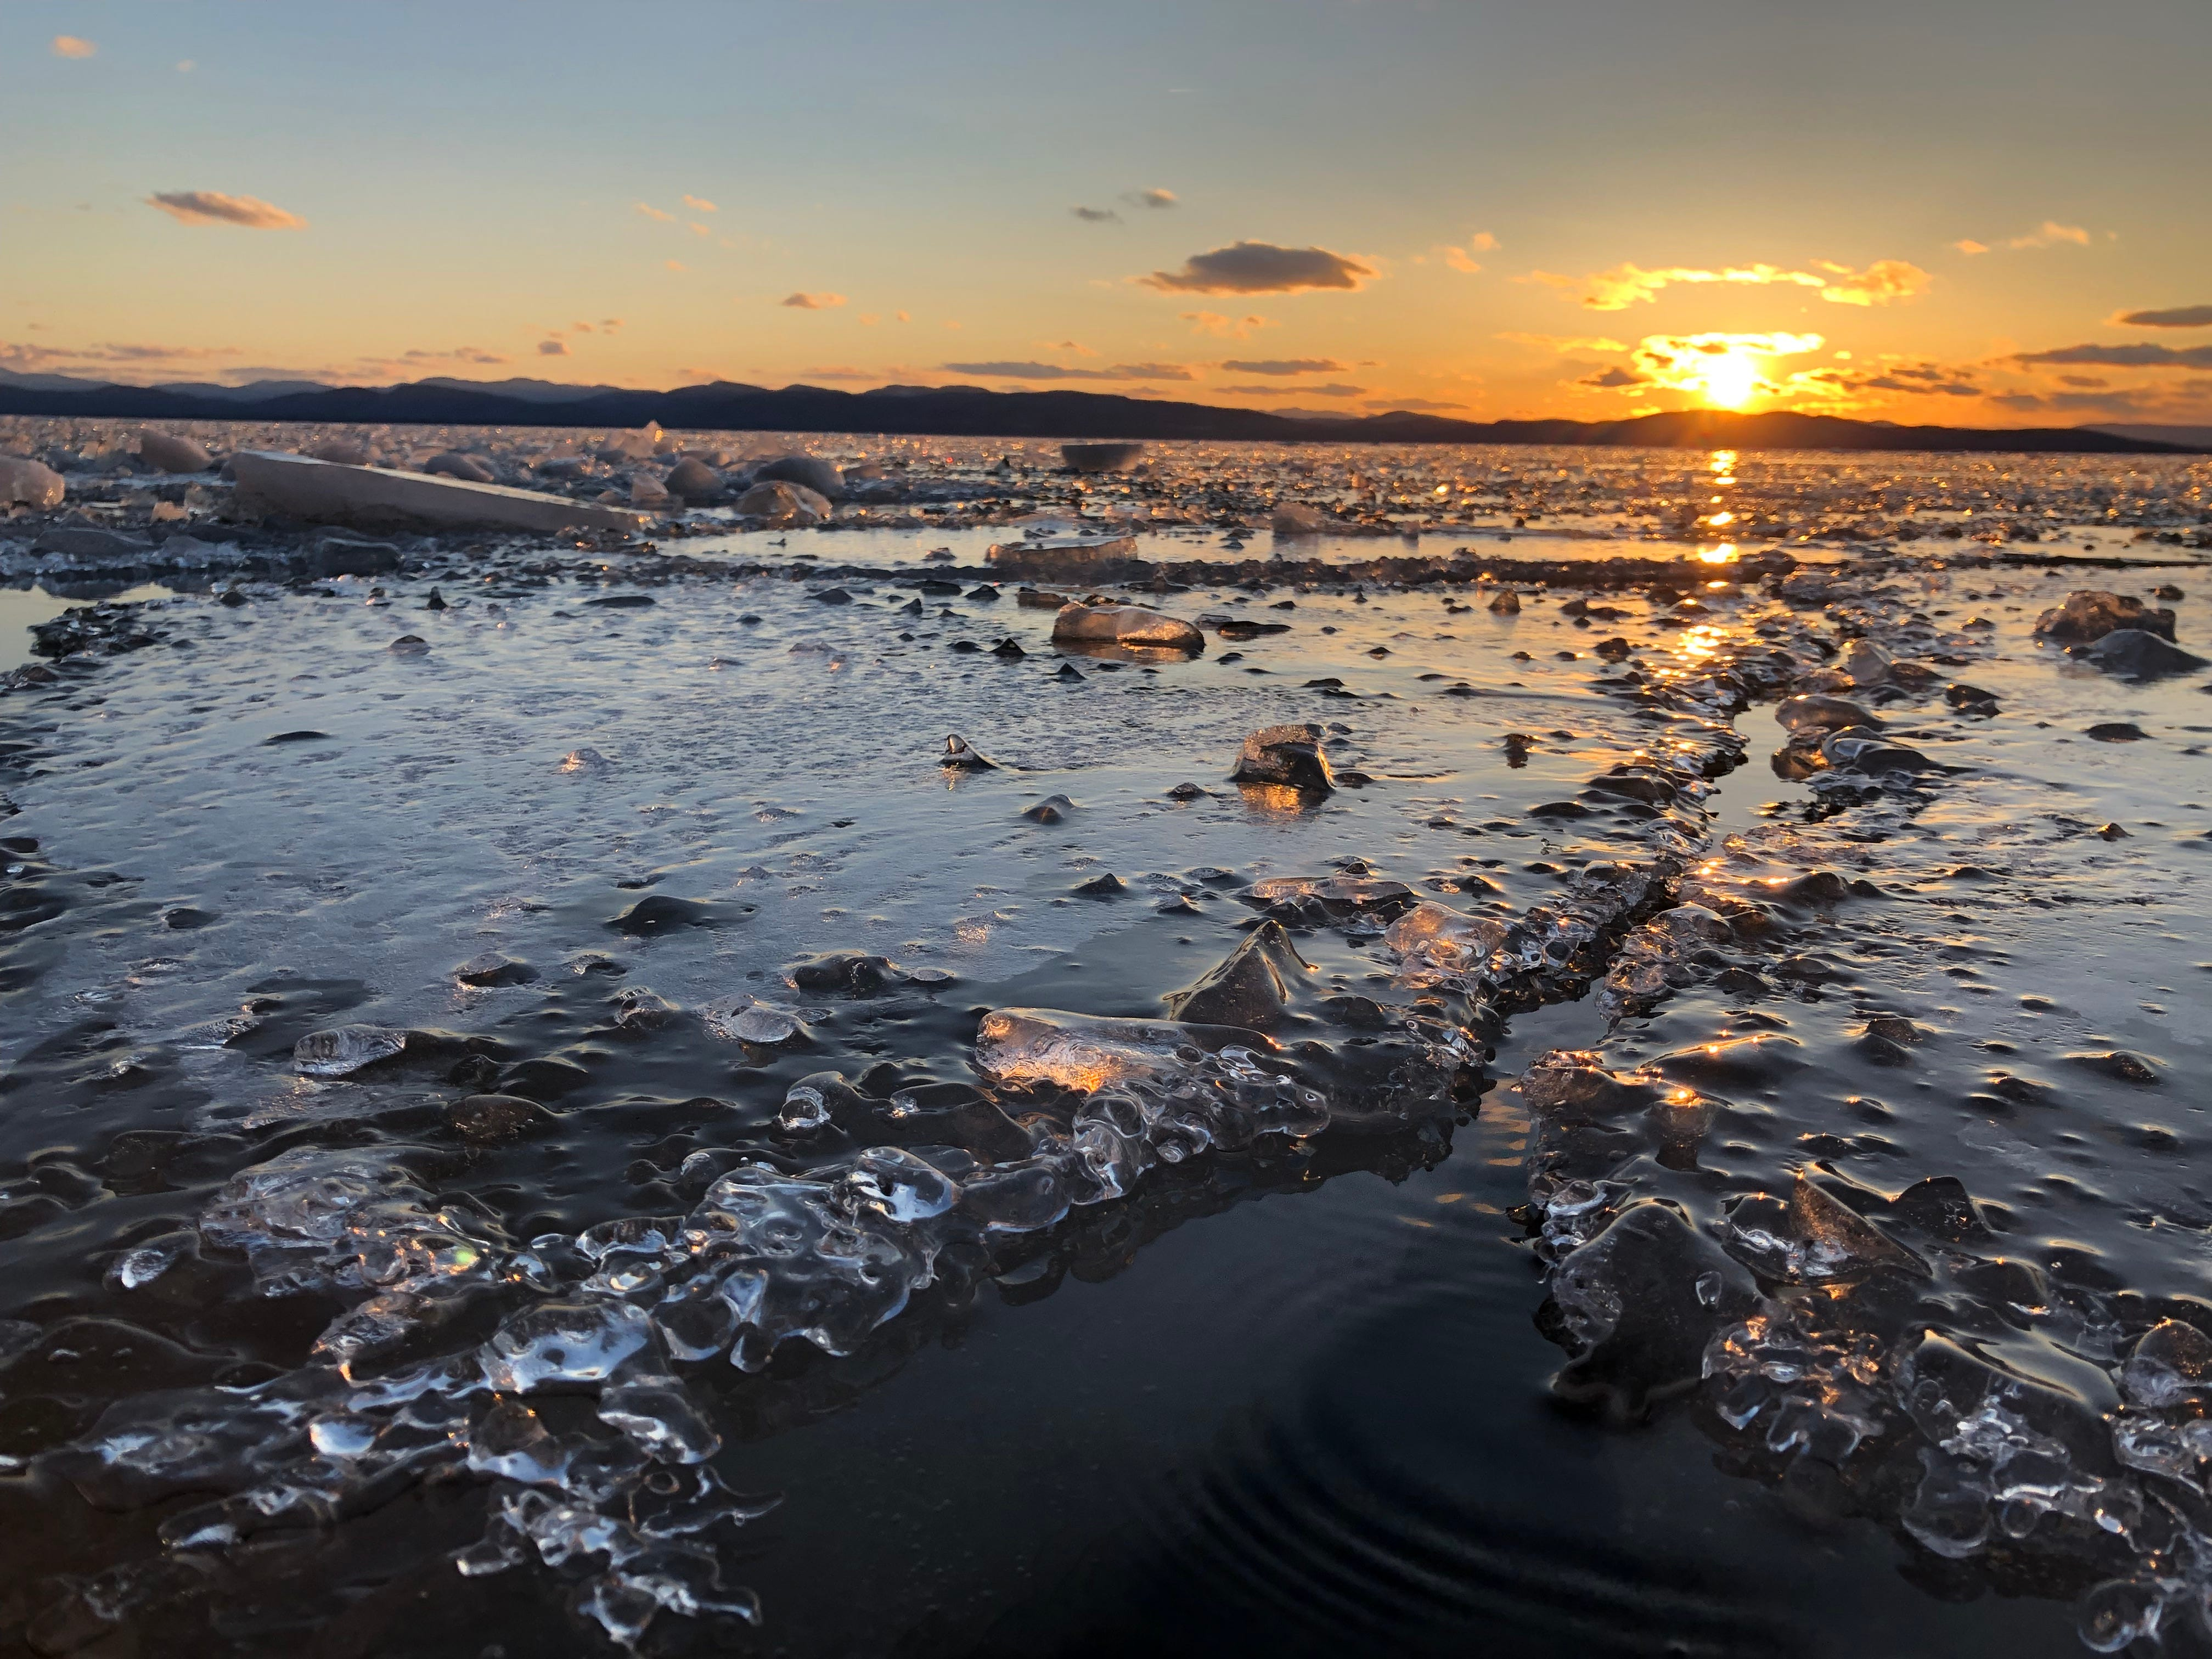 Ground zero: Ice and water greet Burlington artist (and swimmer) Katharine Montstream at a Lake Champlain shoreline April 1, 2019.